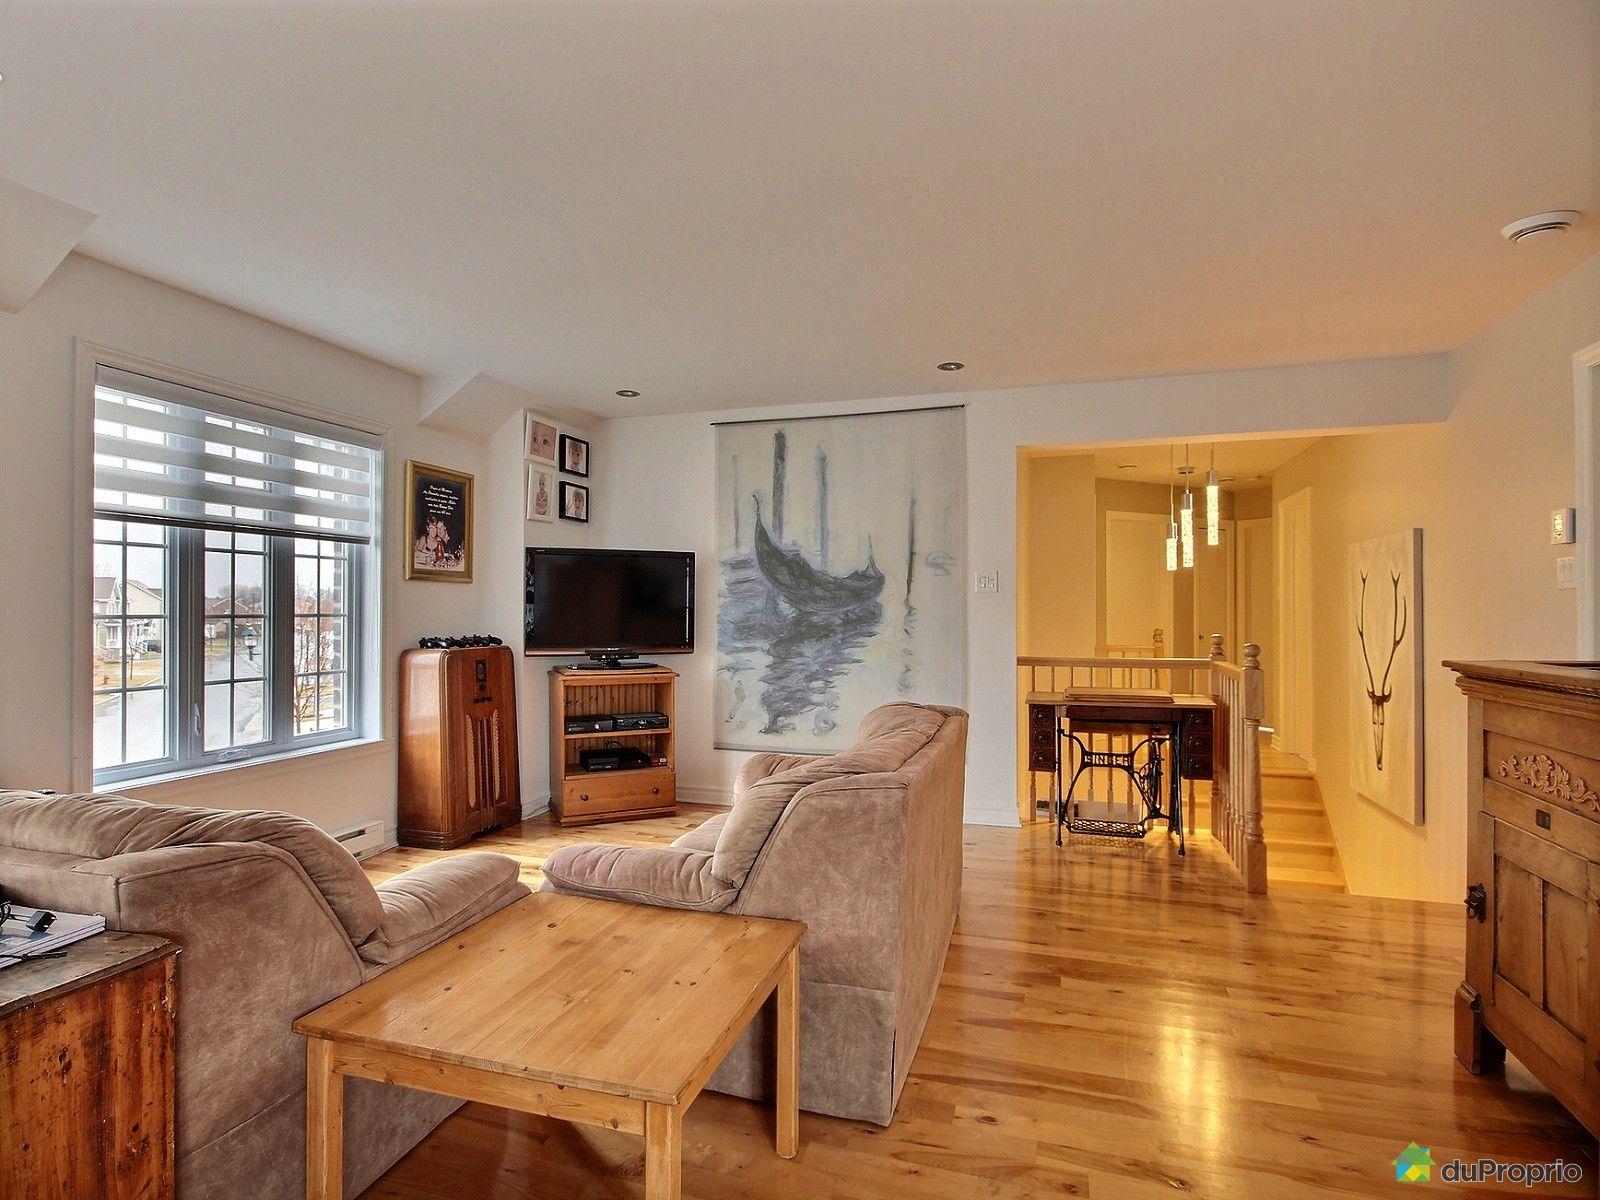 bi g n ration vendre mascouche 2846 2848 rue fran oise giroud immobilier qu bec duproprio. Black Bedroom Furniture Sets. Home Design Ideas